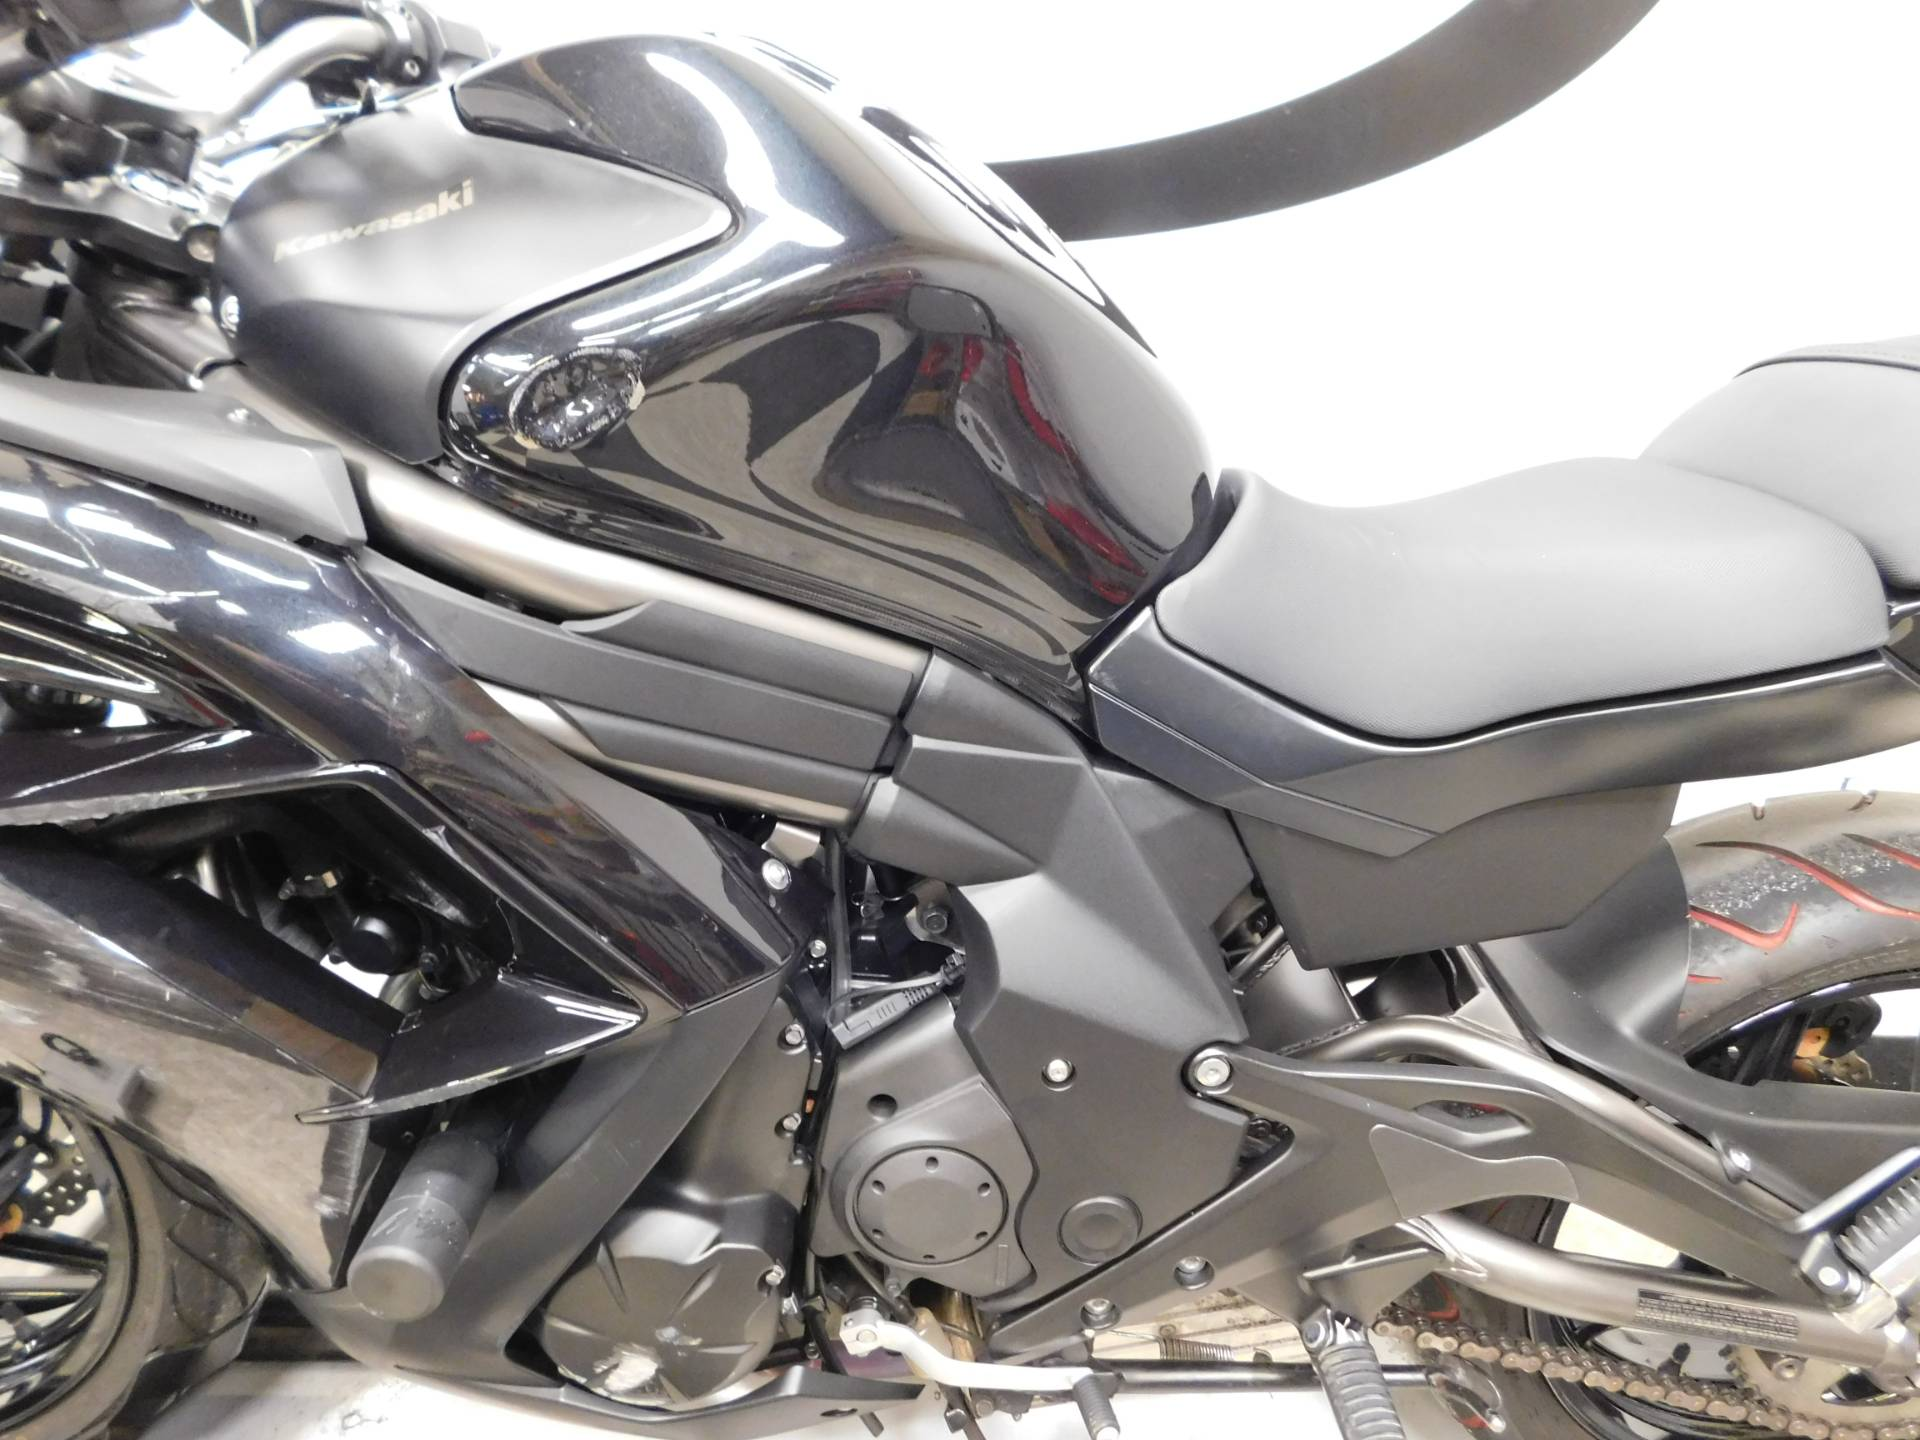 2012 Kawasaki Ninja 650 11